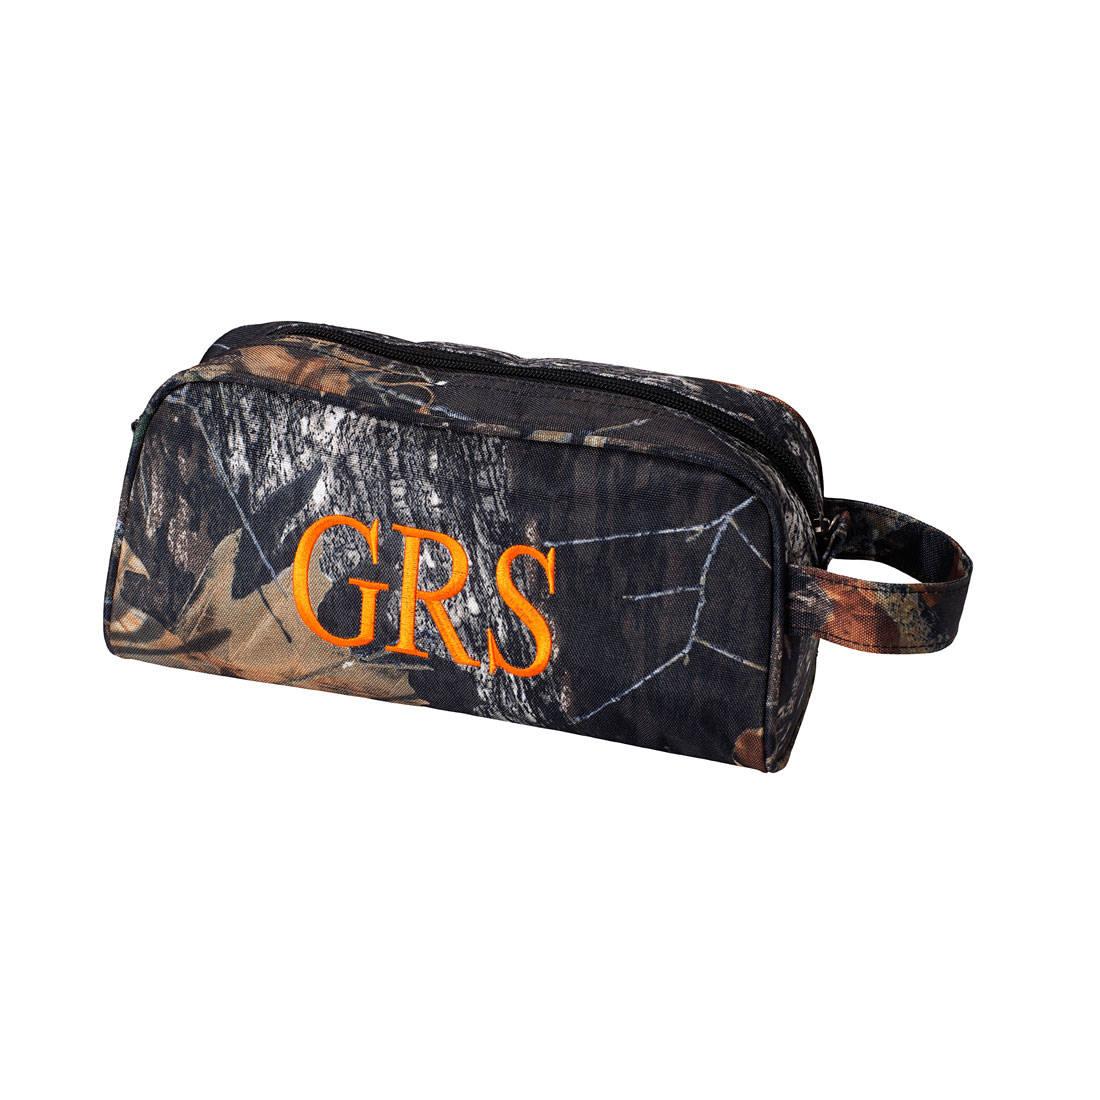 d3a093a8512e Personalize Toiletry Bag Camo